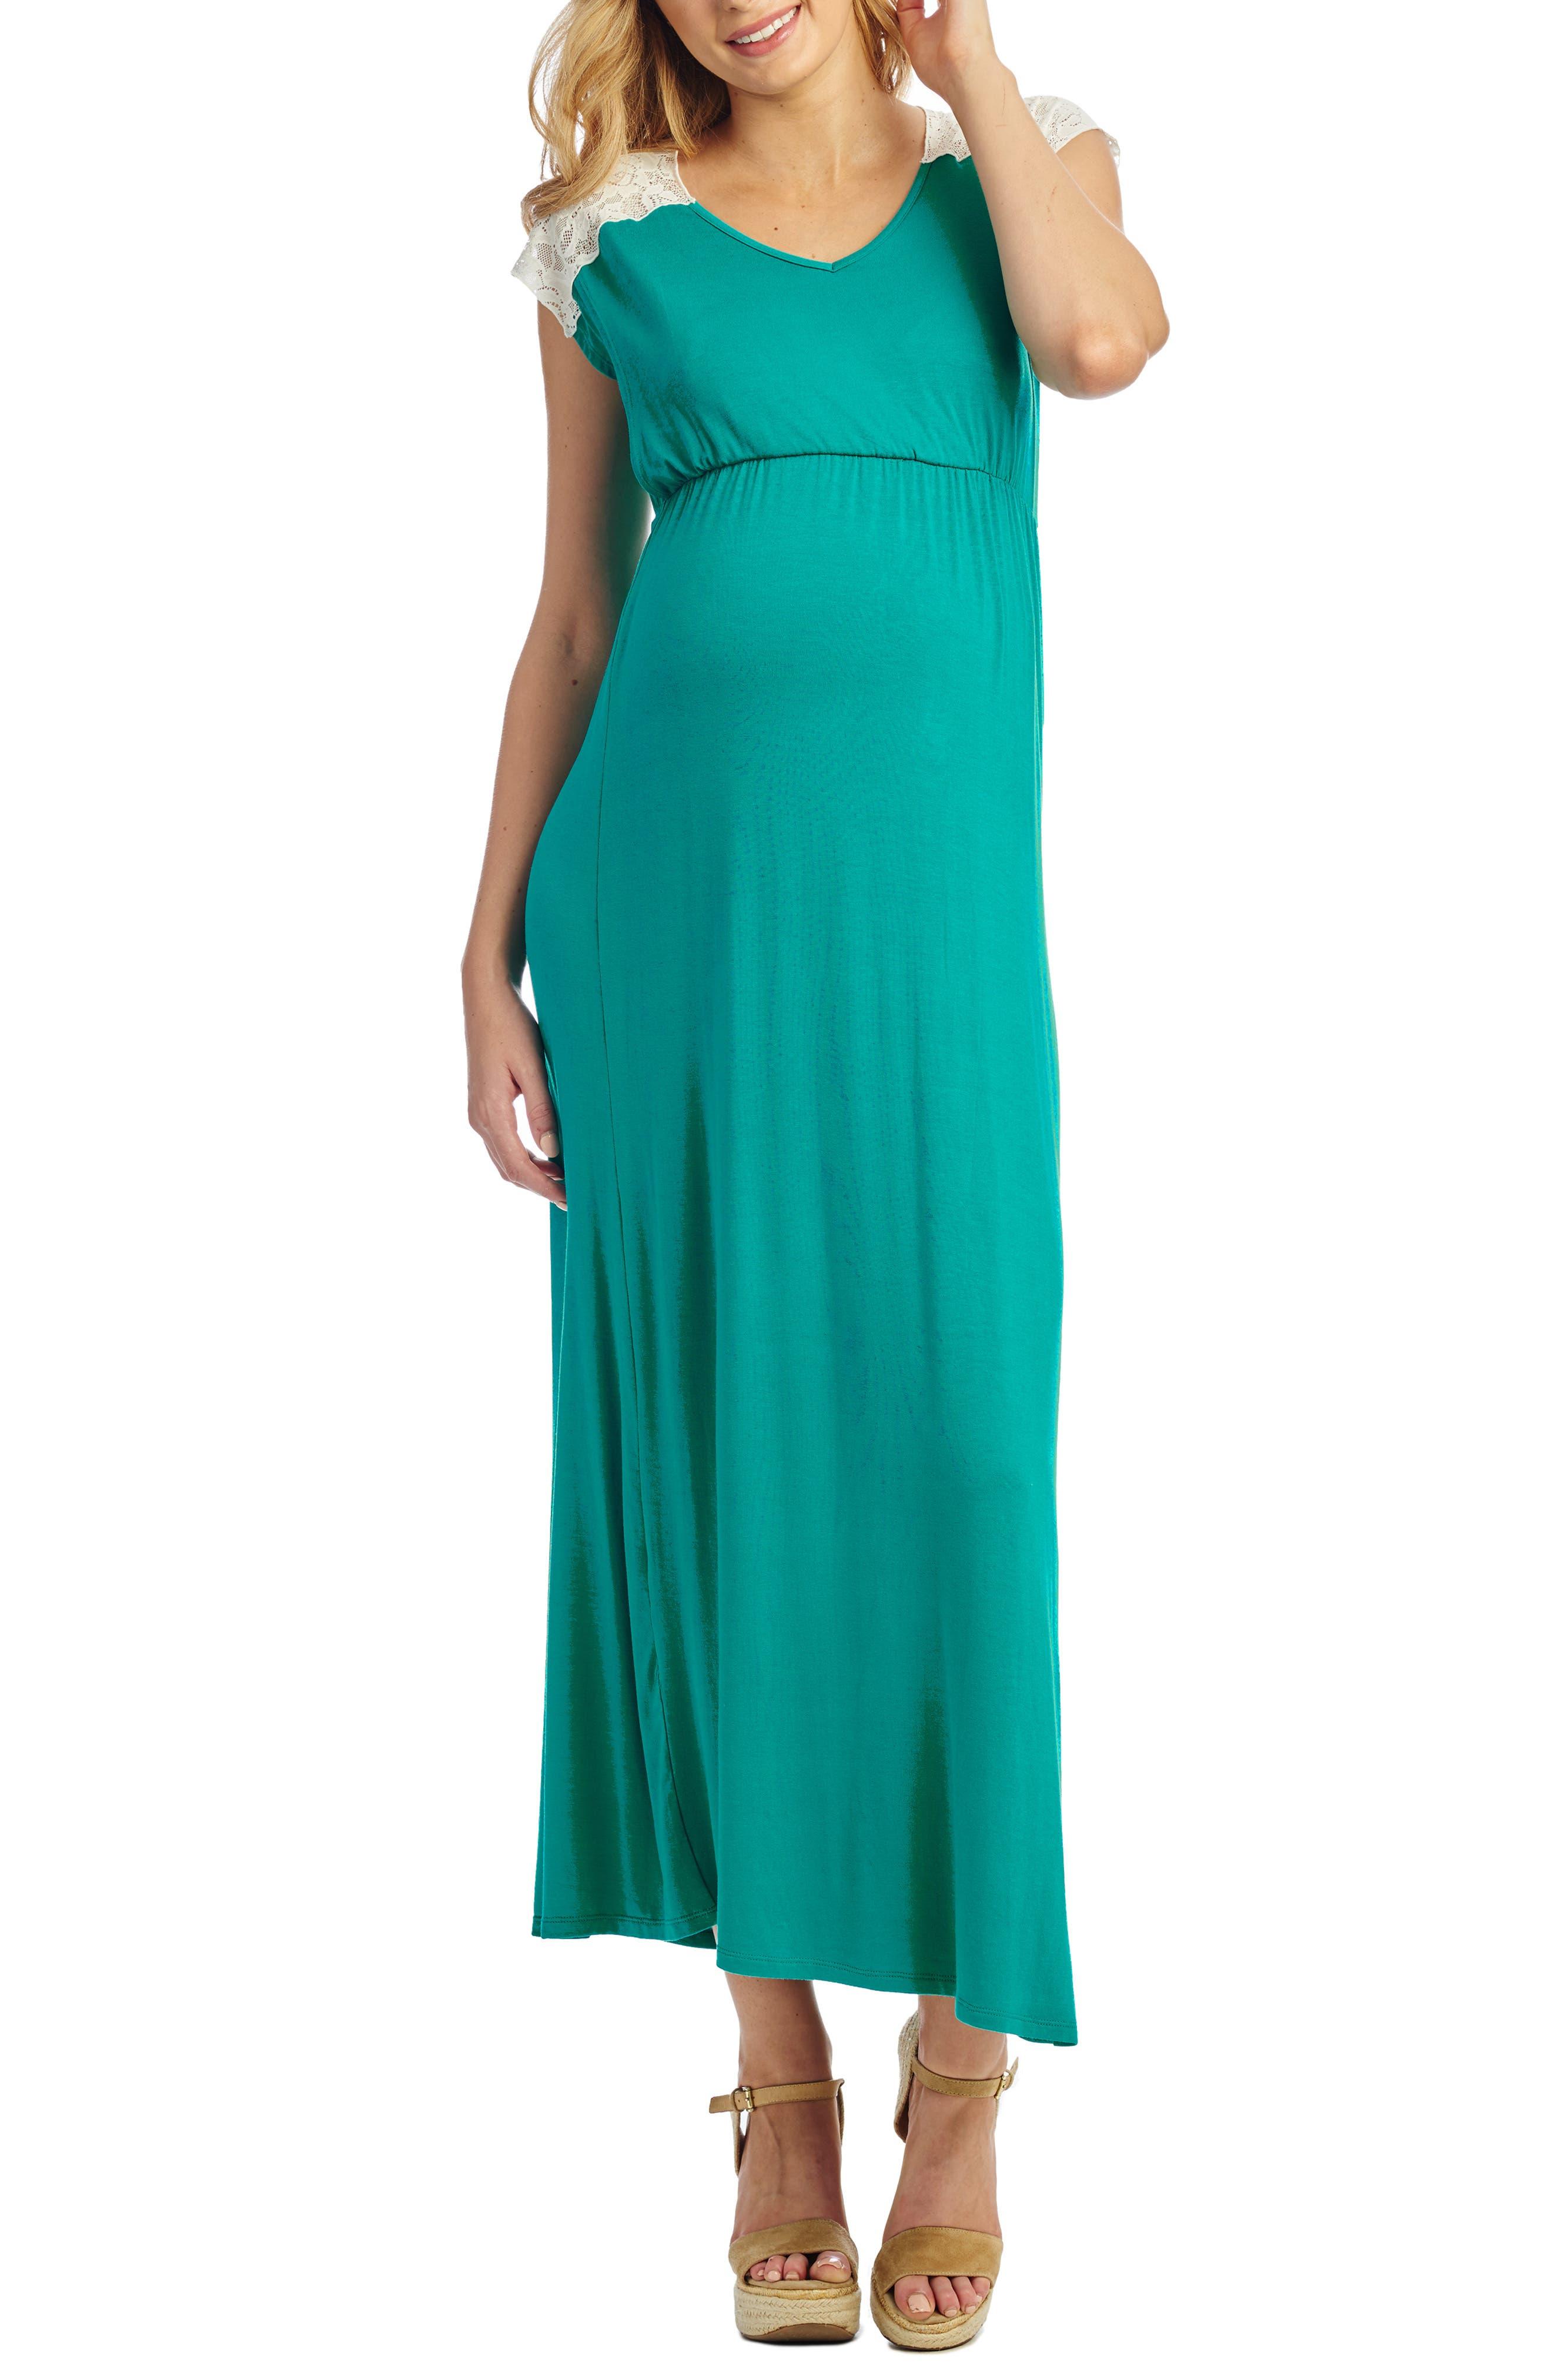 Everly Grey Margaret Maternity/nursing Maxi Dress, Green